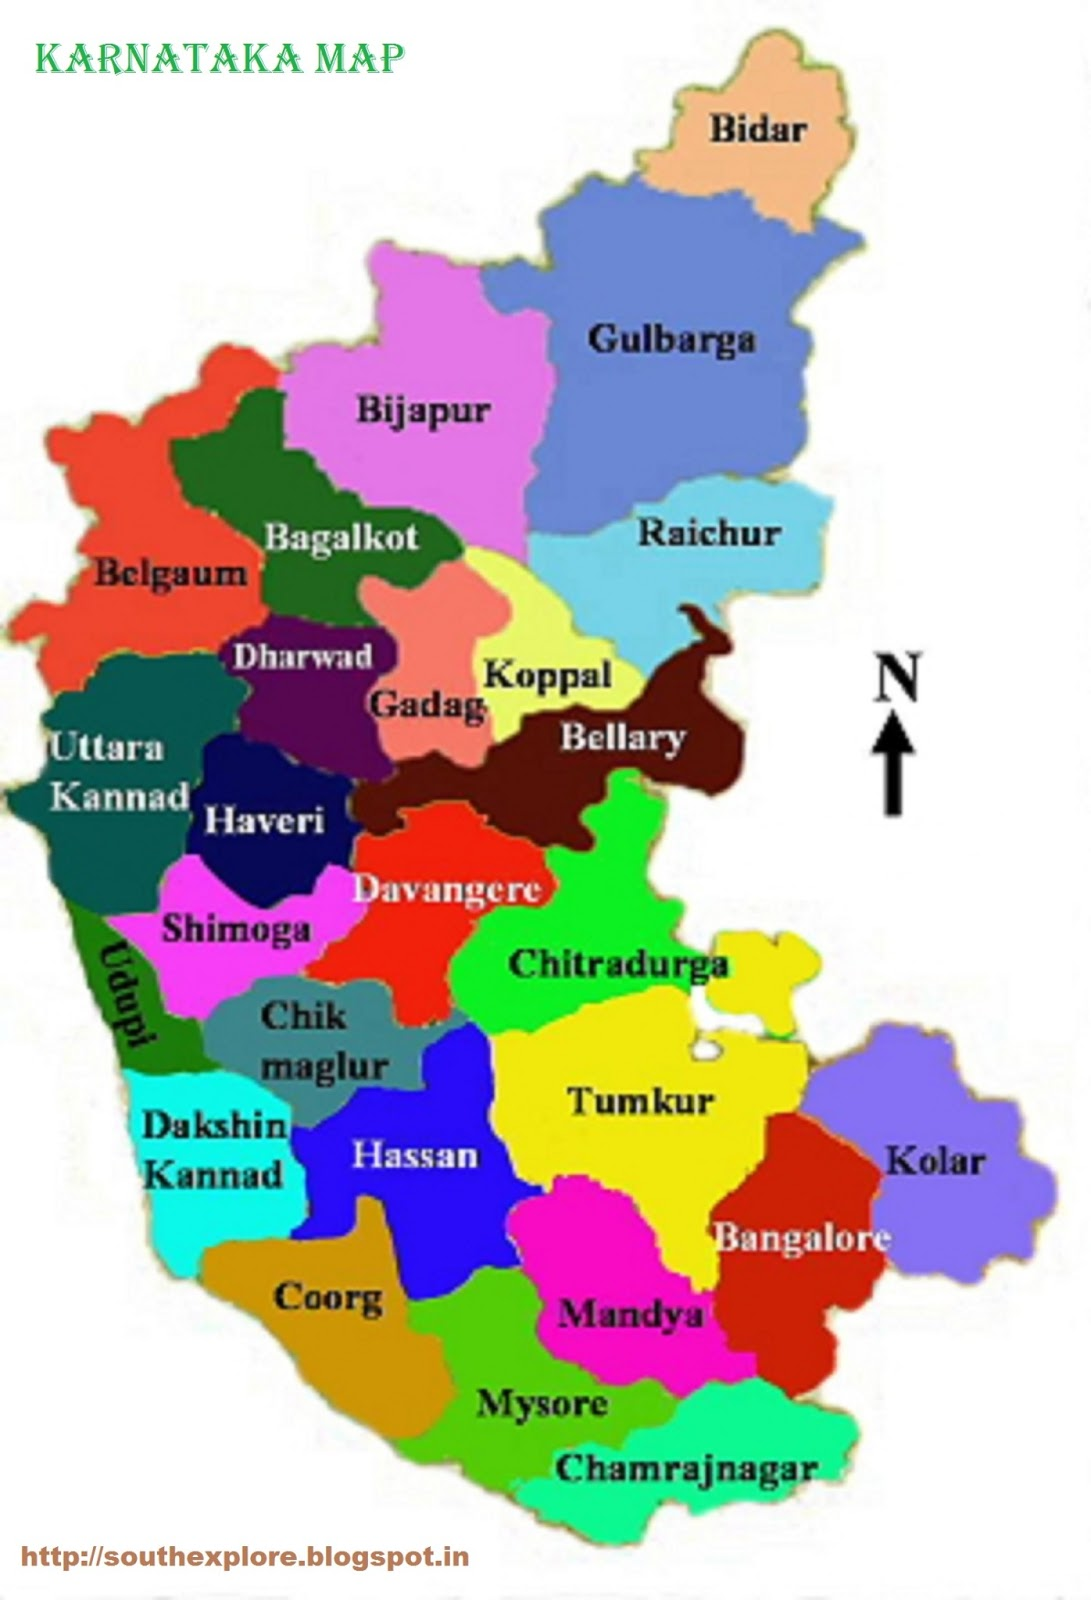 maps  south india tourism - maps · karnataka tourism